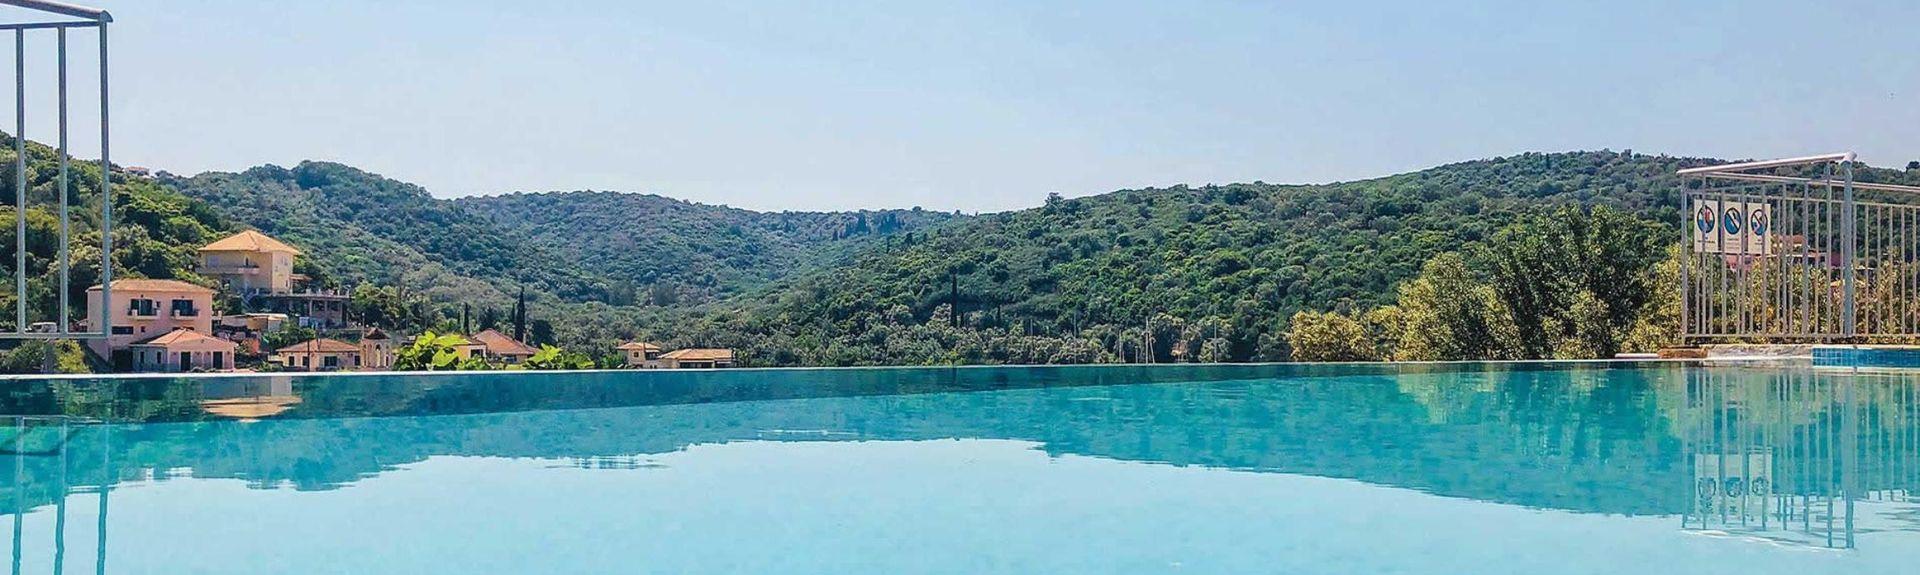 Nidri-fallene, Nidri, Peloponnes, Hellas